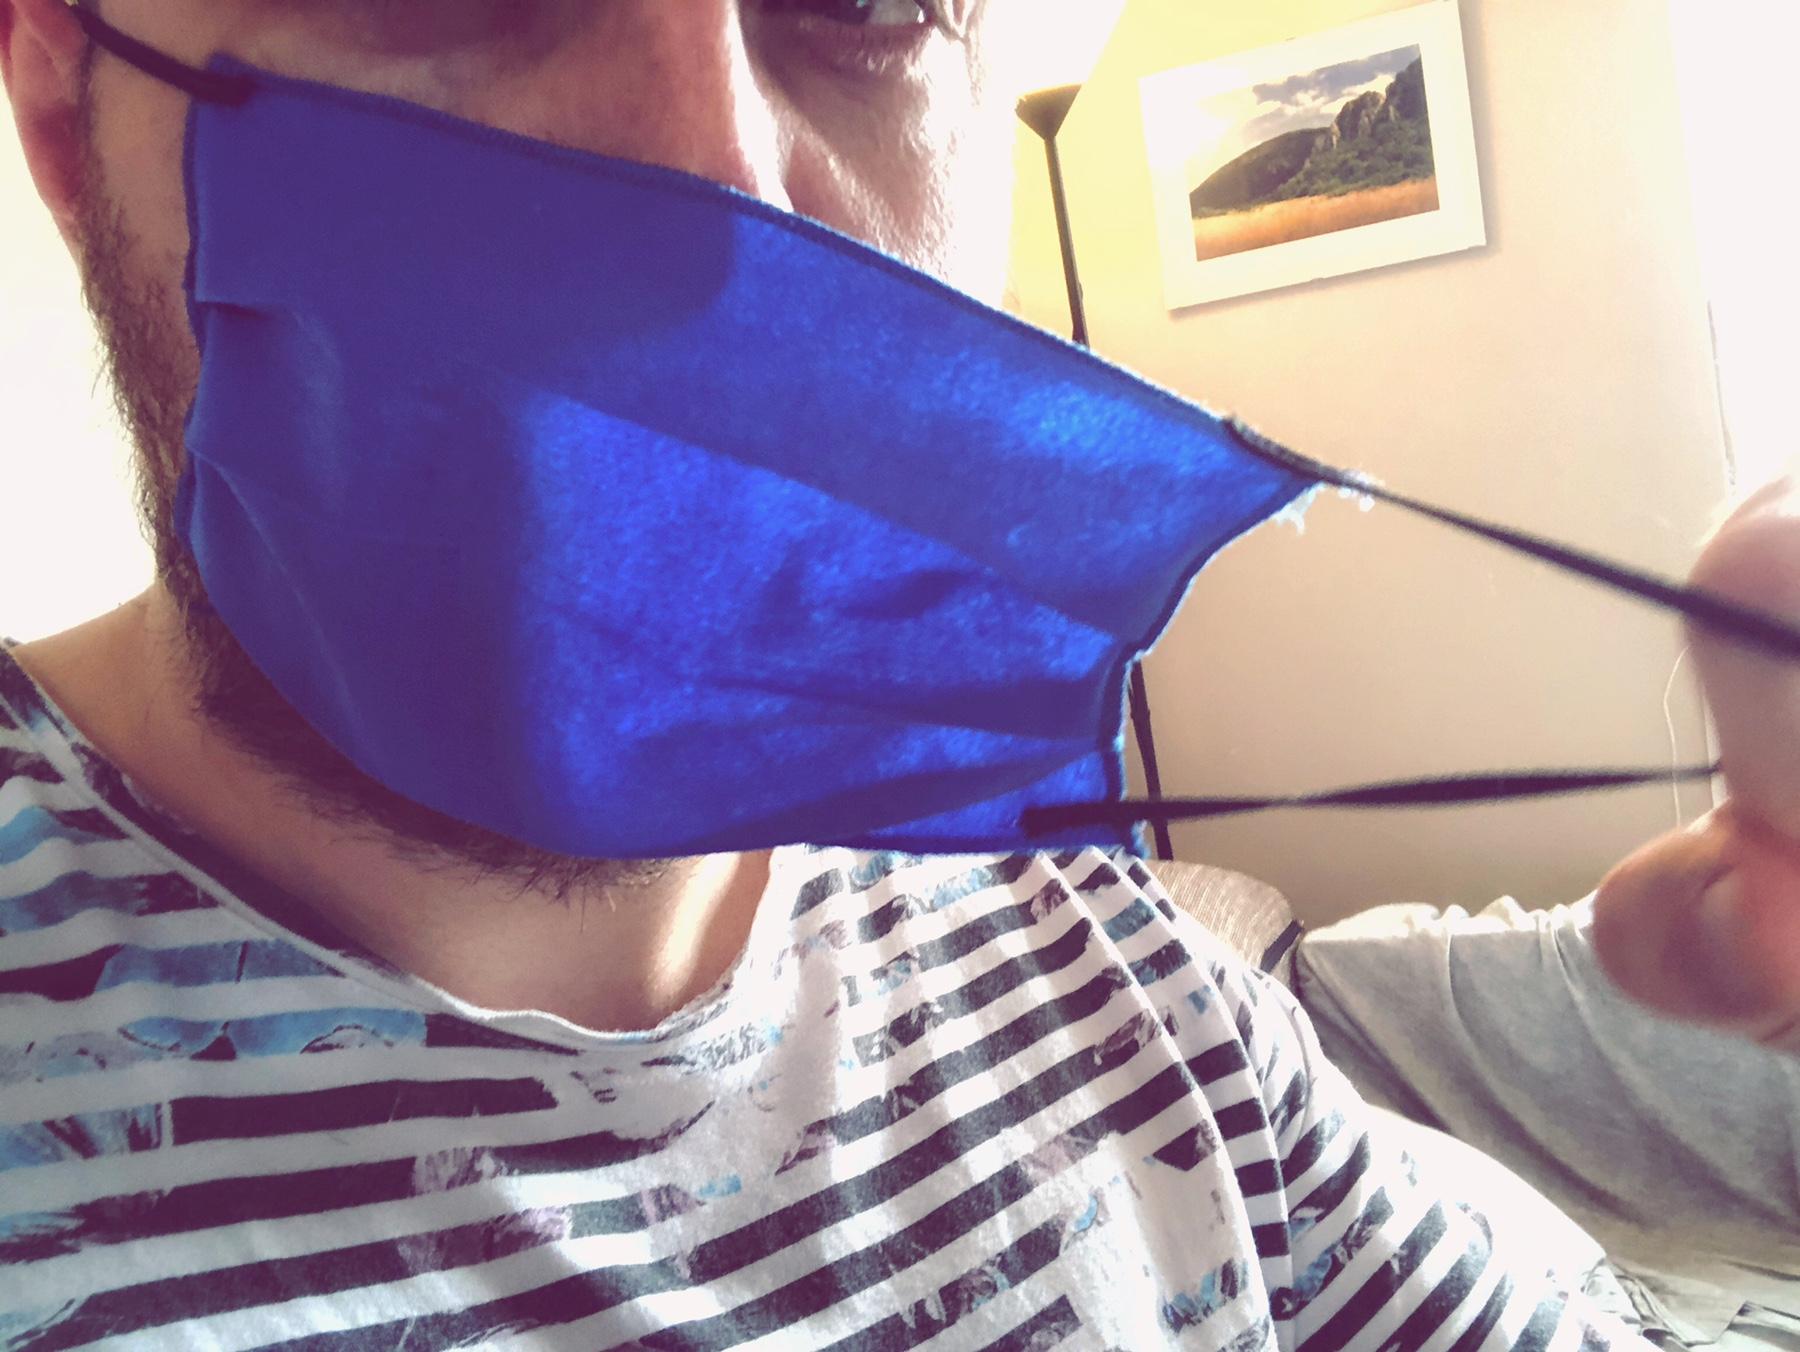 Zaštitna maska, foto: M.M.